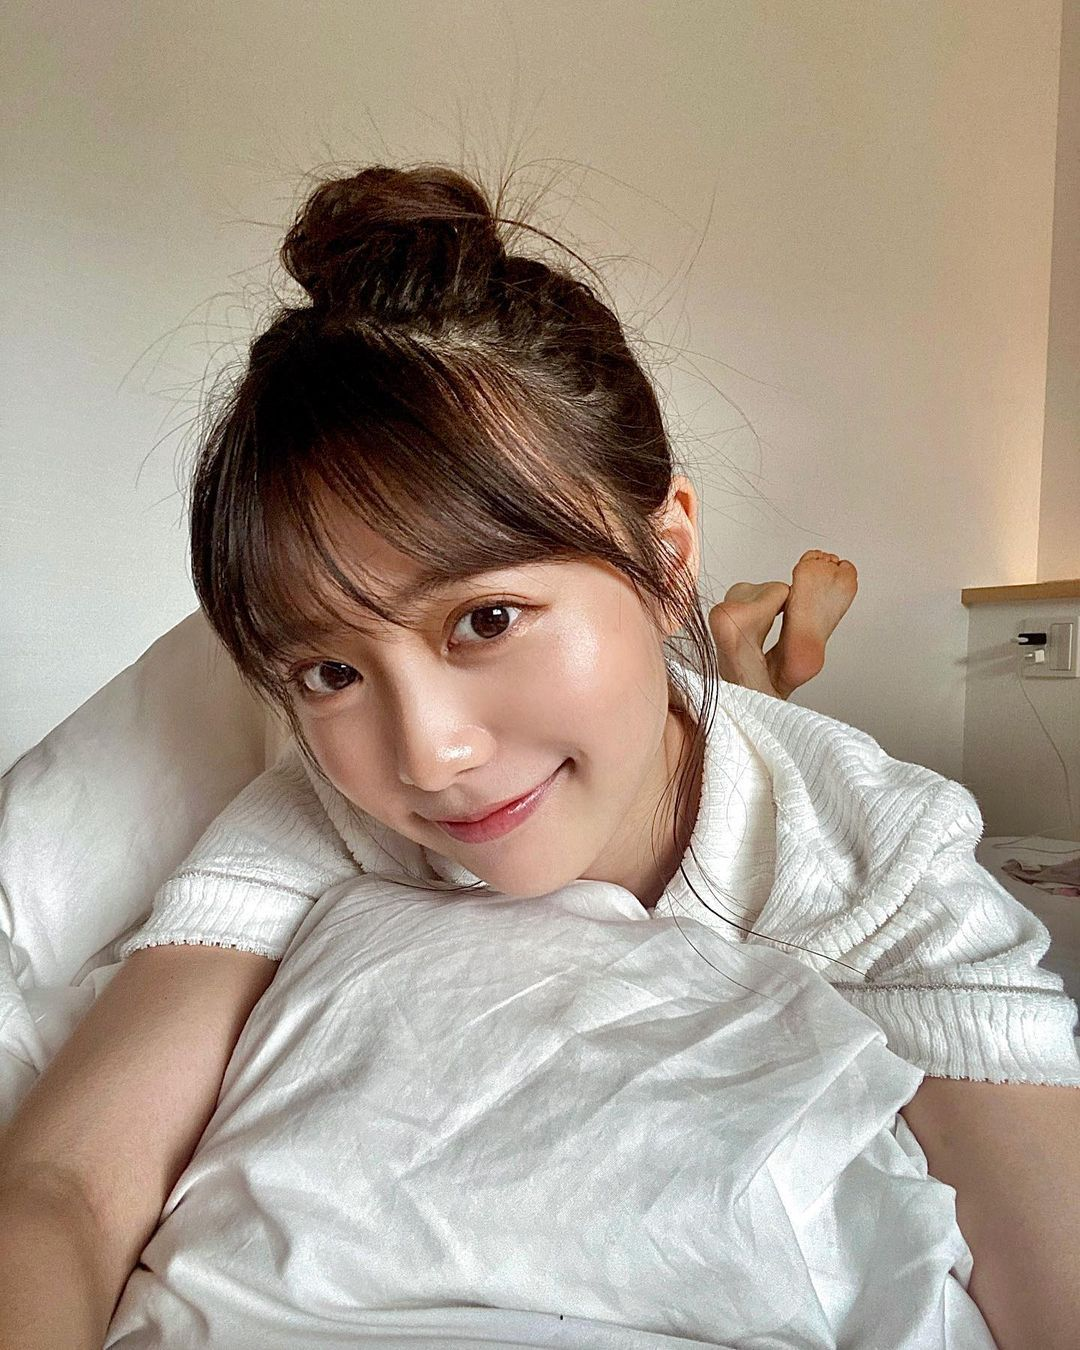 [日本]选美比赛亚军.新田さちか甜美外型深受喜爱 网络美女 第7张